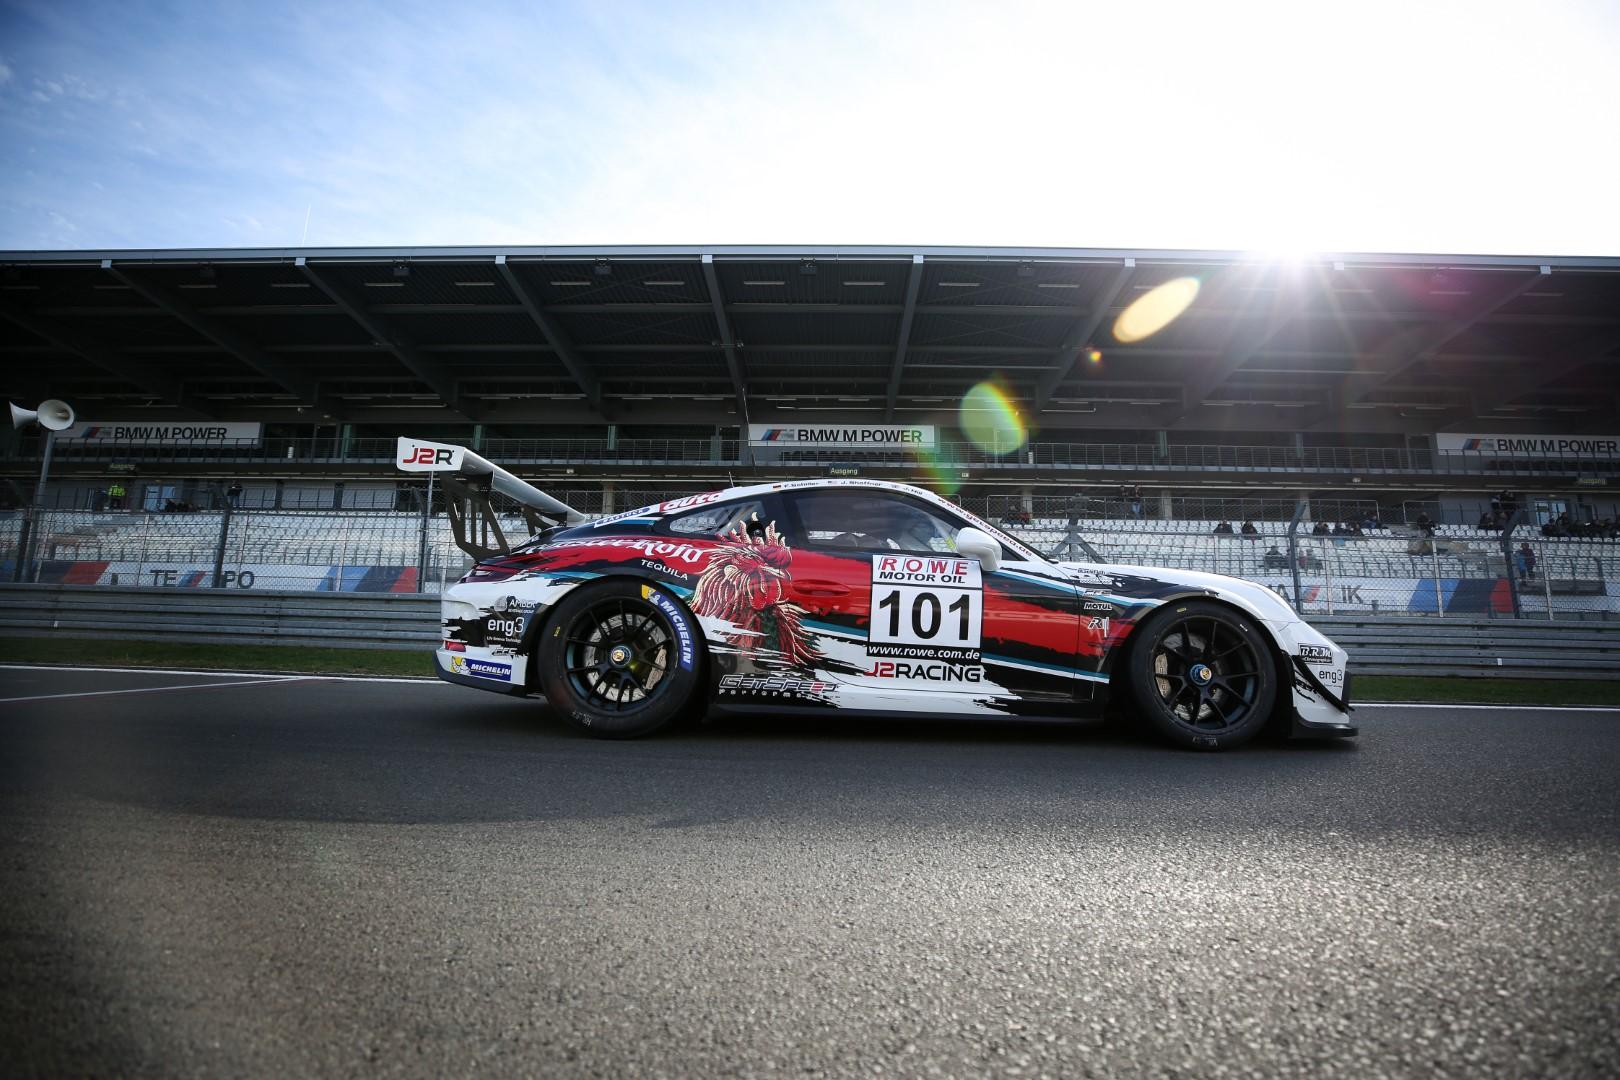 VLN 9. Lauf 2018, Nürburgring-Nordschleife - Foto: Gruppe C Photography; #101 Porsche 911 GT3 Cup, GetSpeed Performance: John Shoffner, Janine Hill, Fabian Schiller